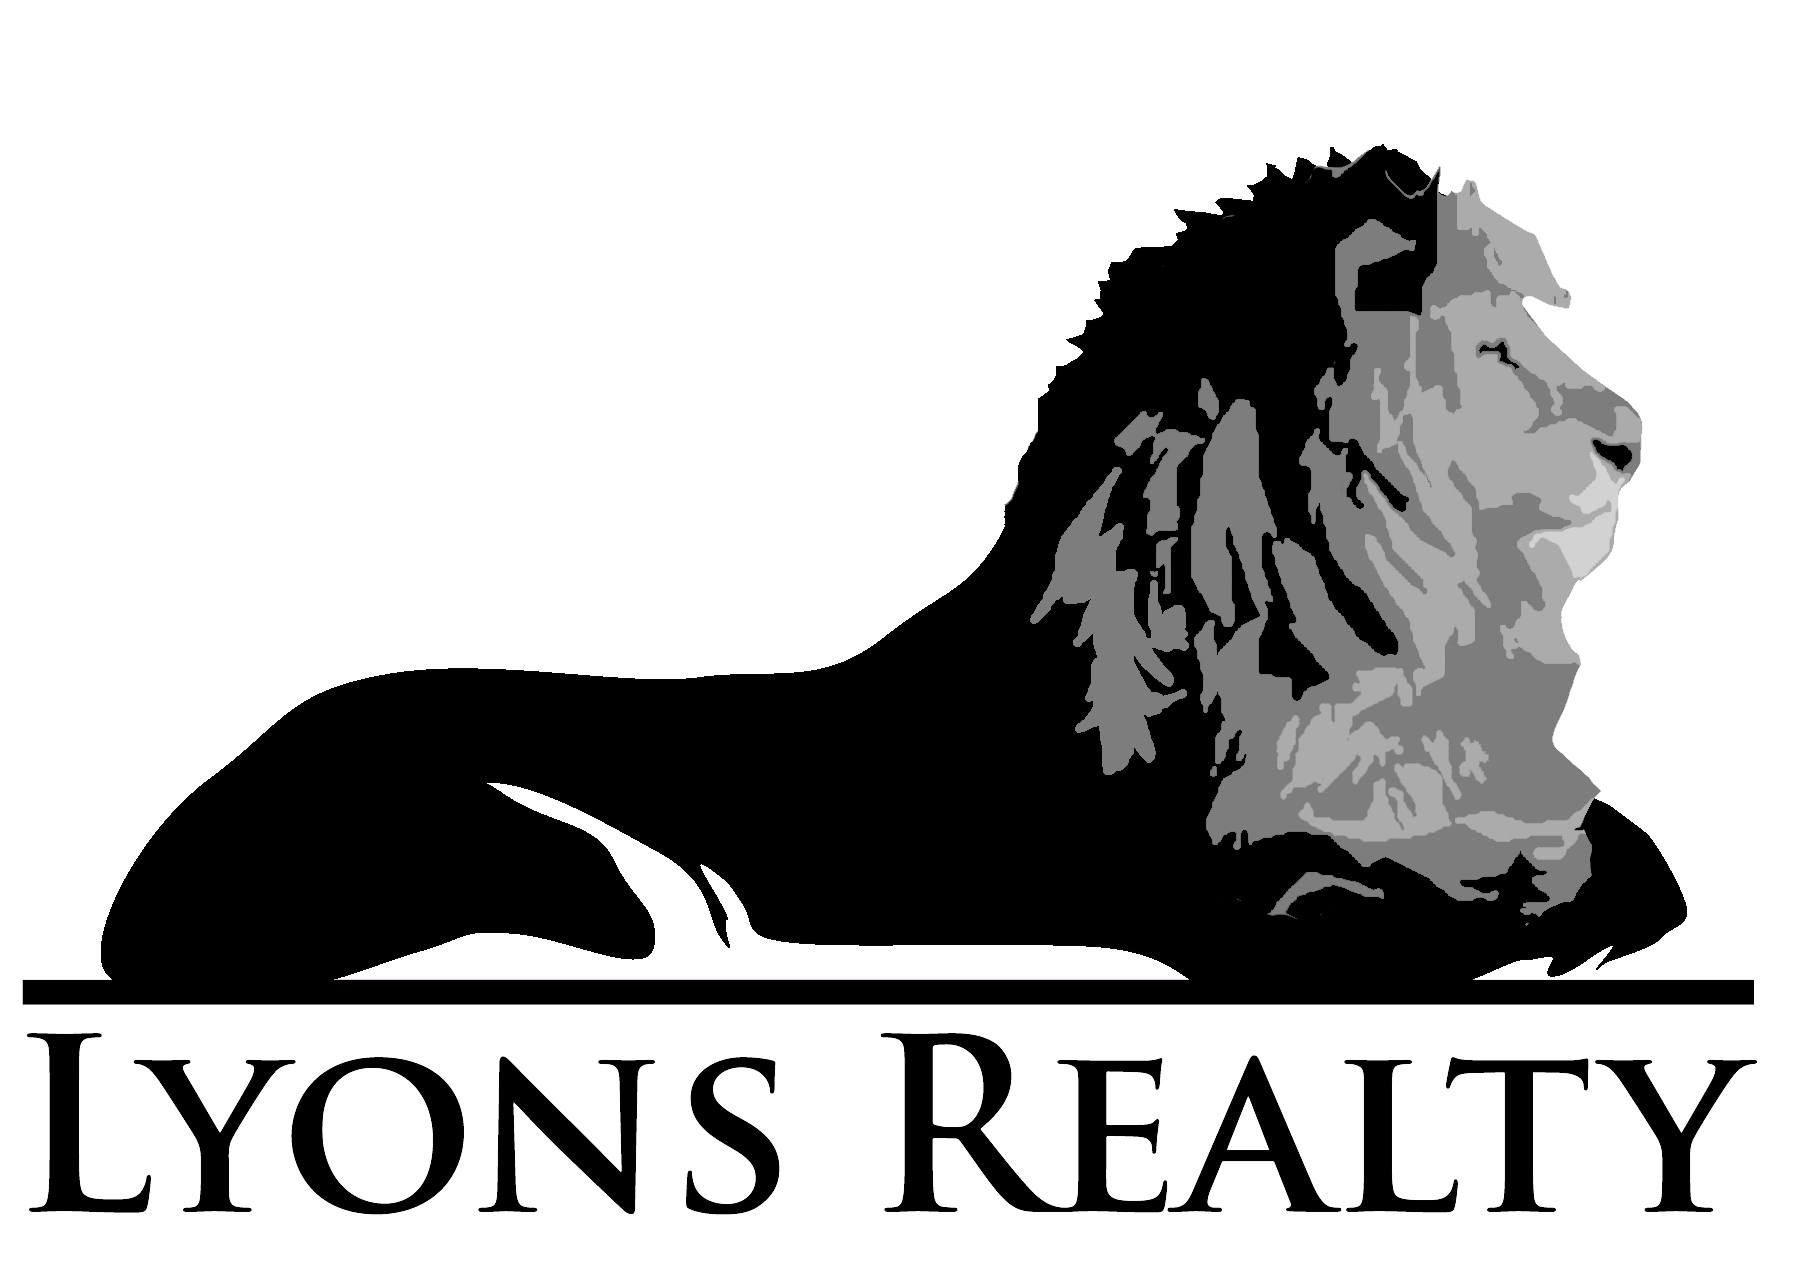 LYONS REALTY LOGO.jpg